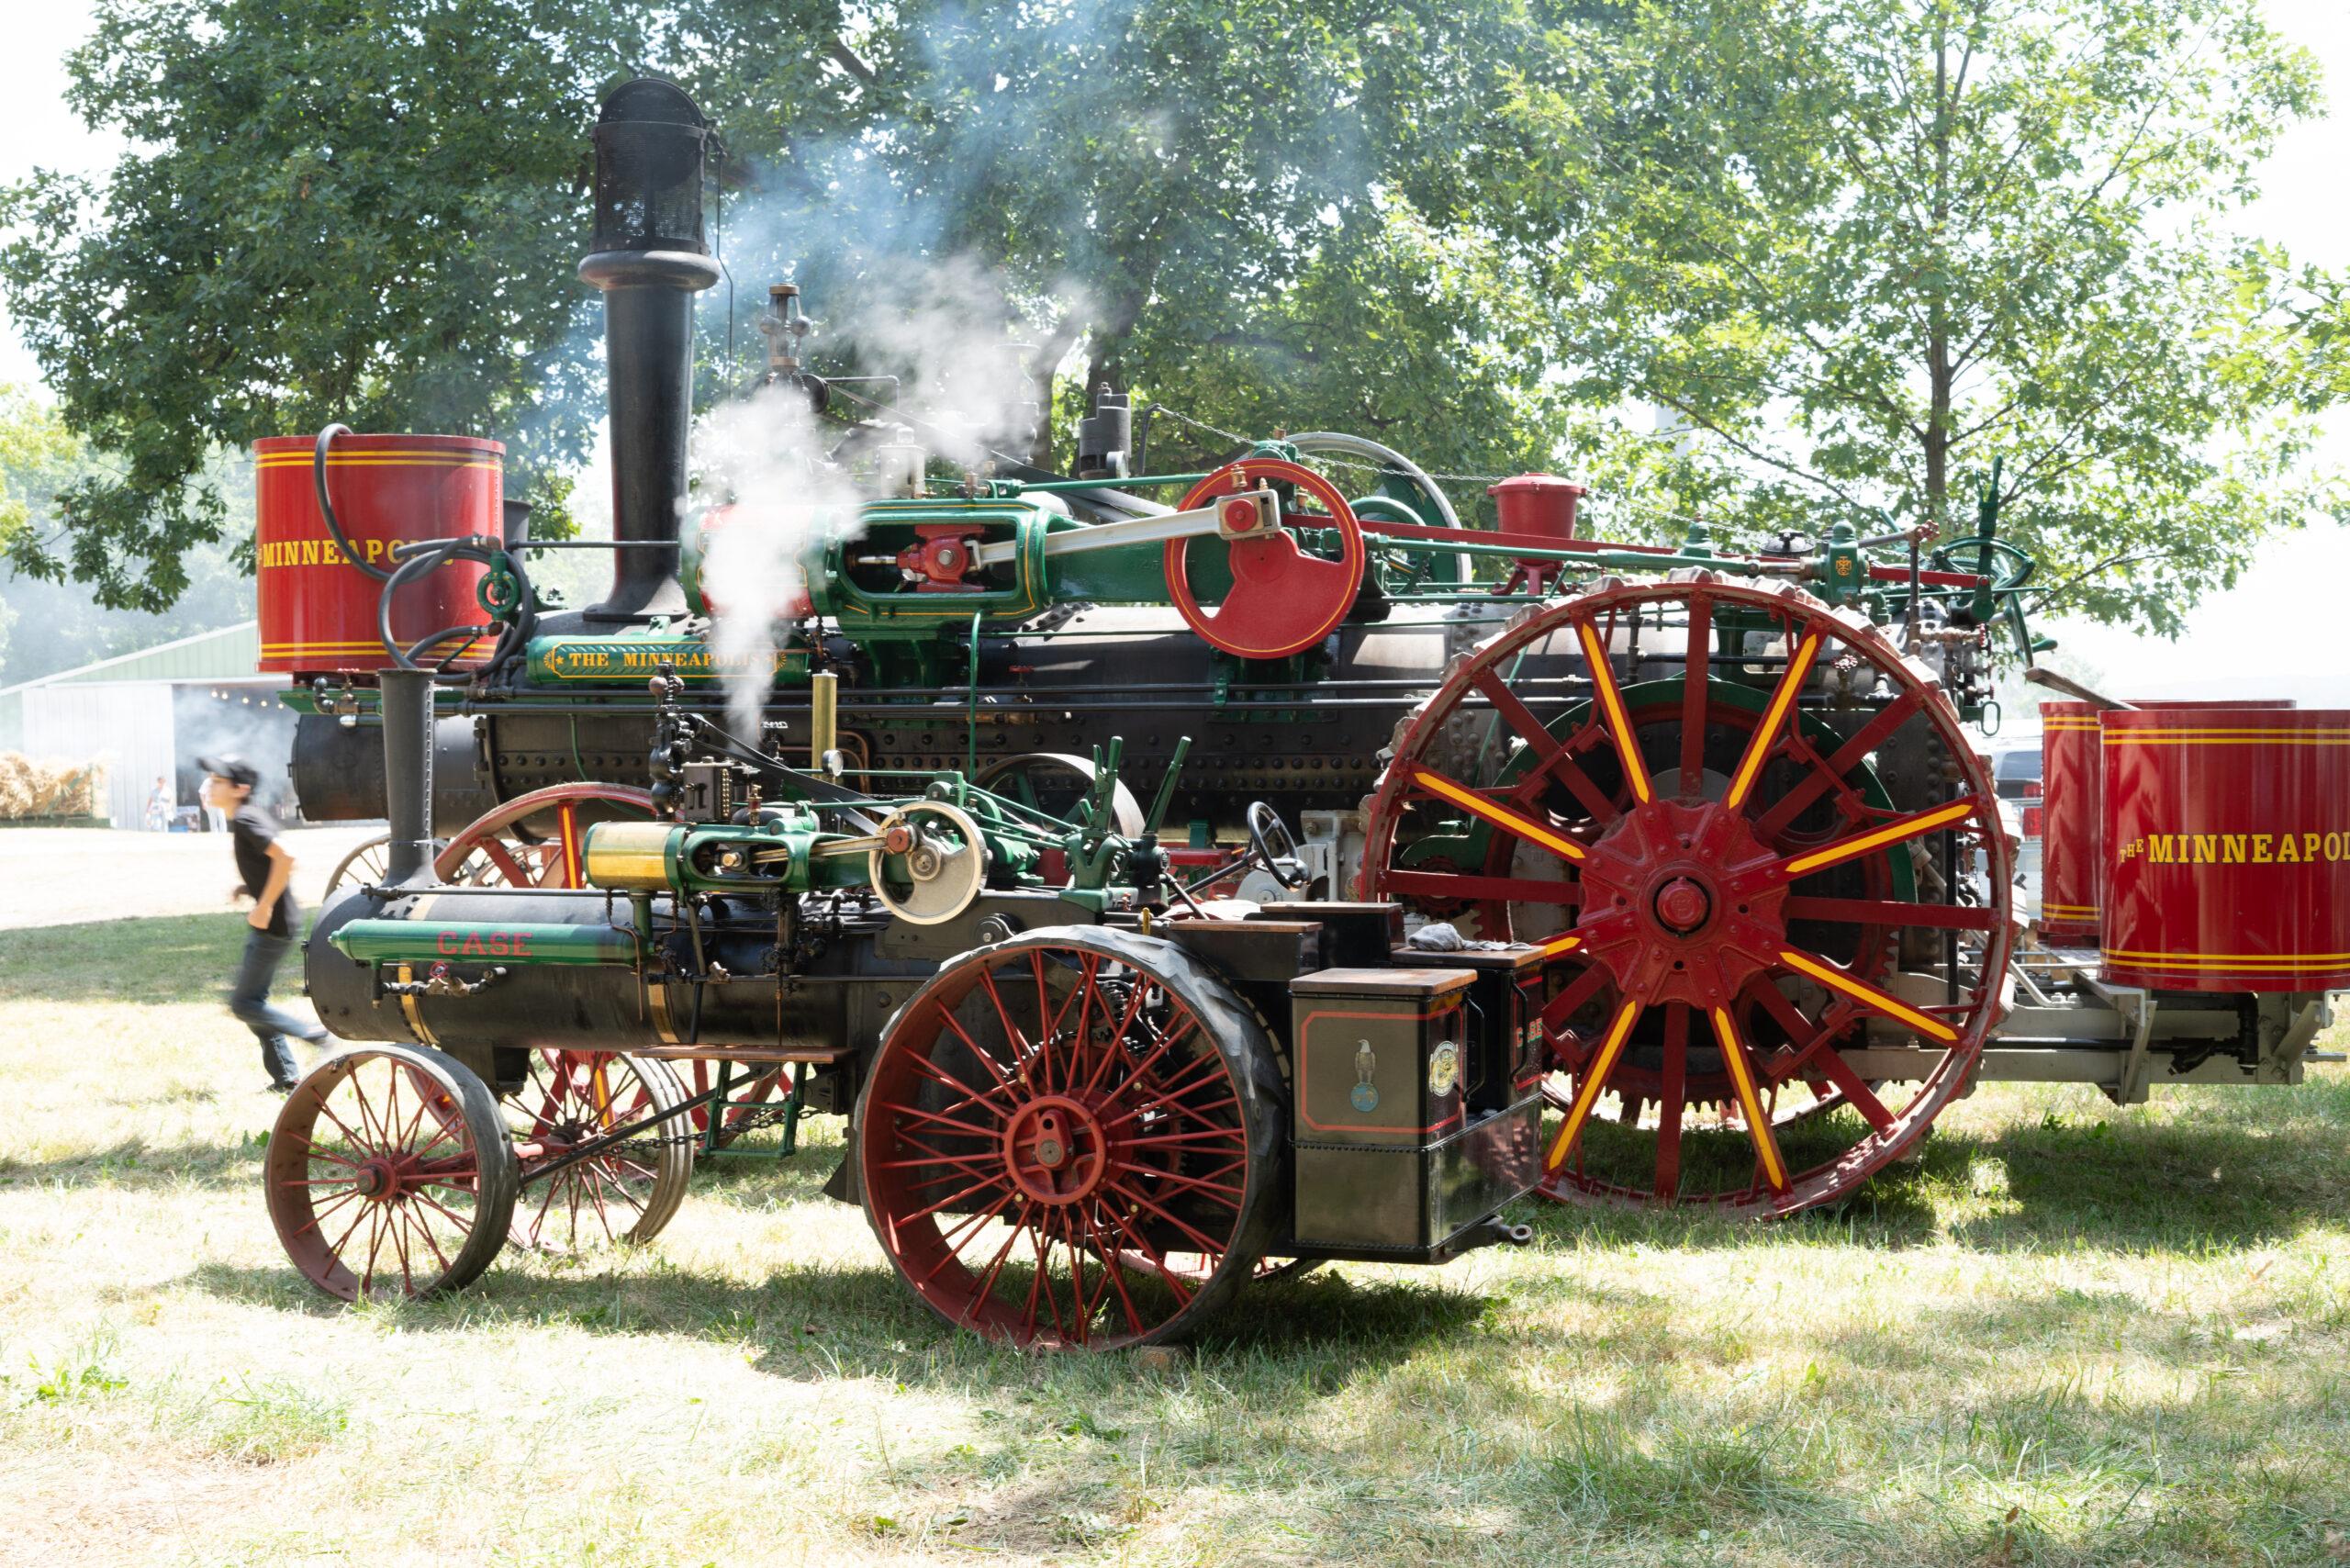 Minneapolis Steam Engine and a Half Scale Case Steam Engine